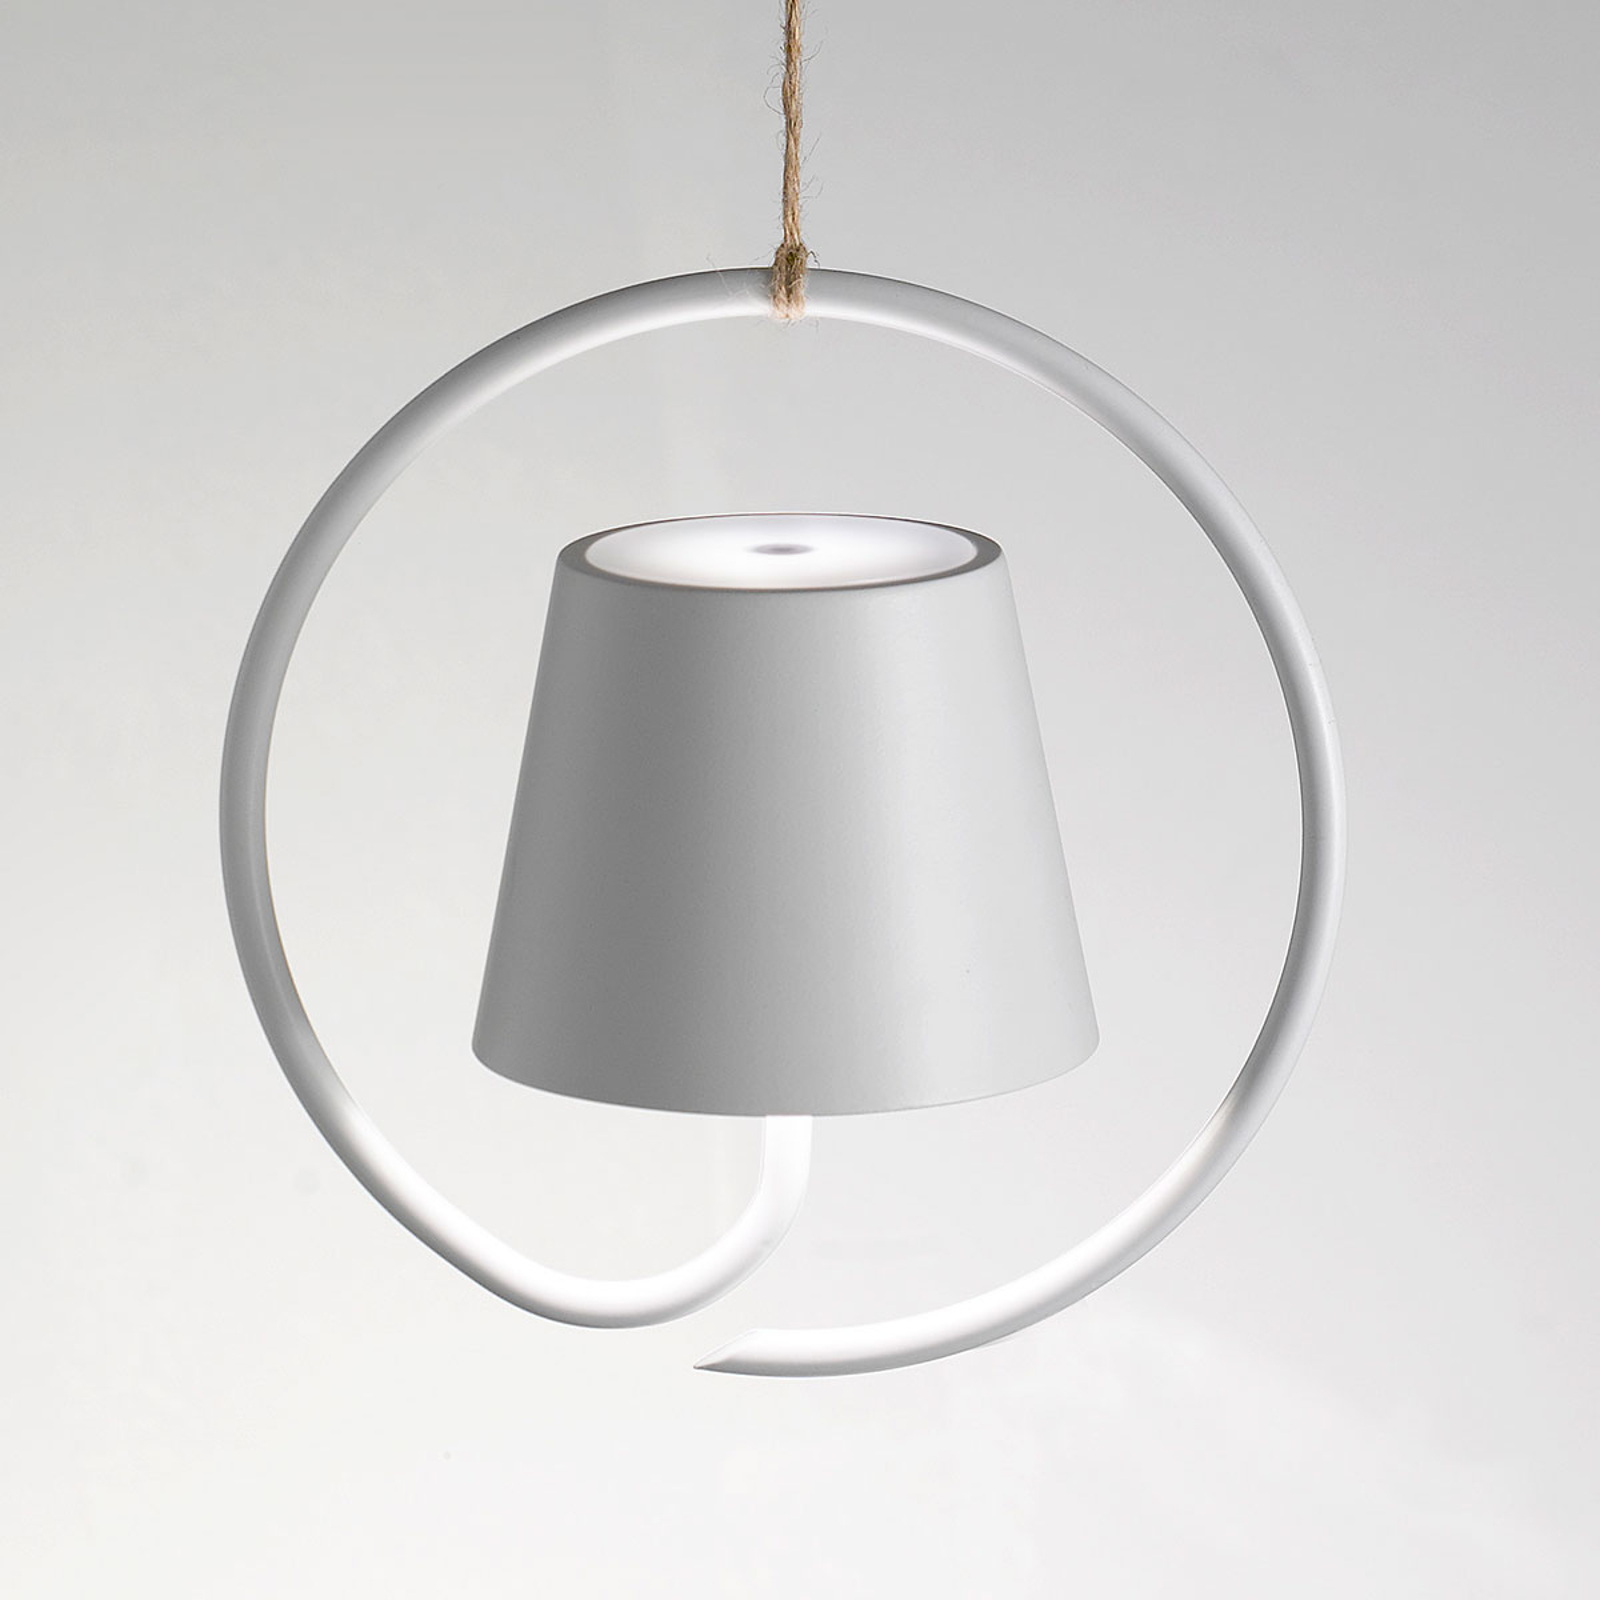 LED hanglamp Poldina op batterijen, wit